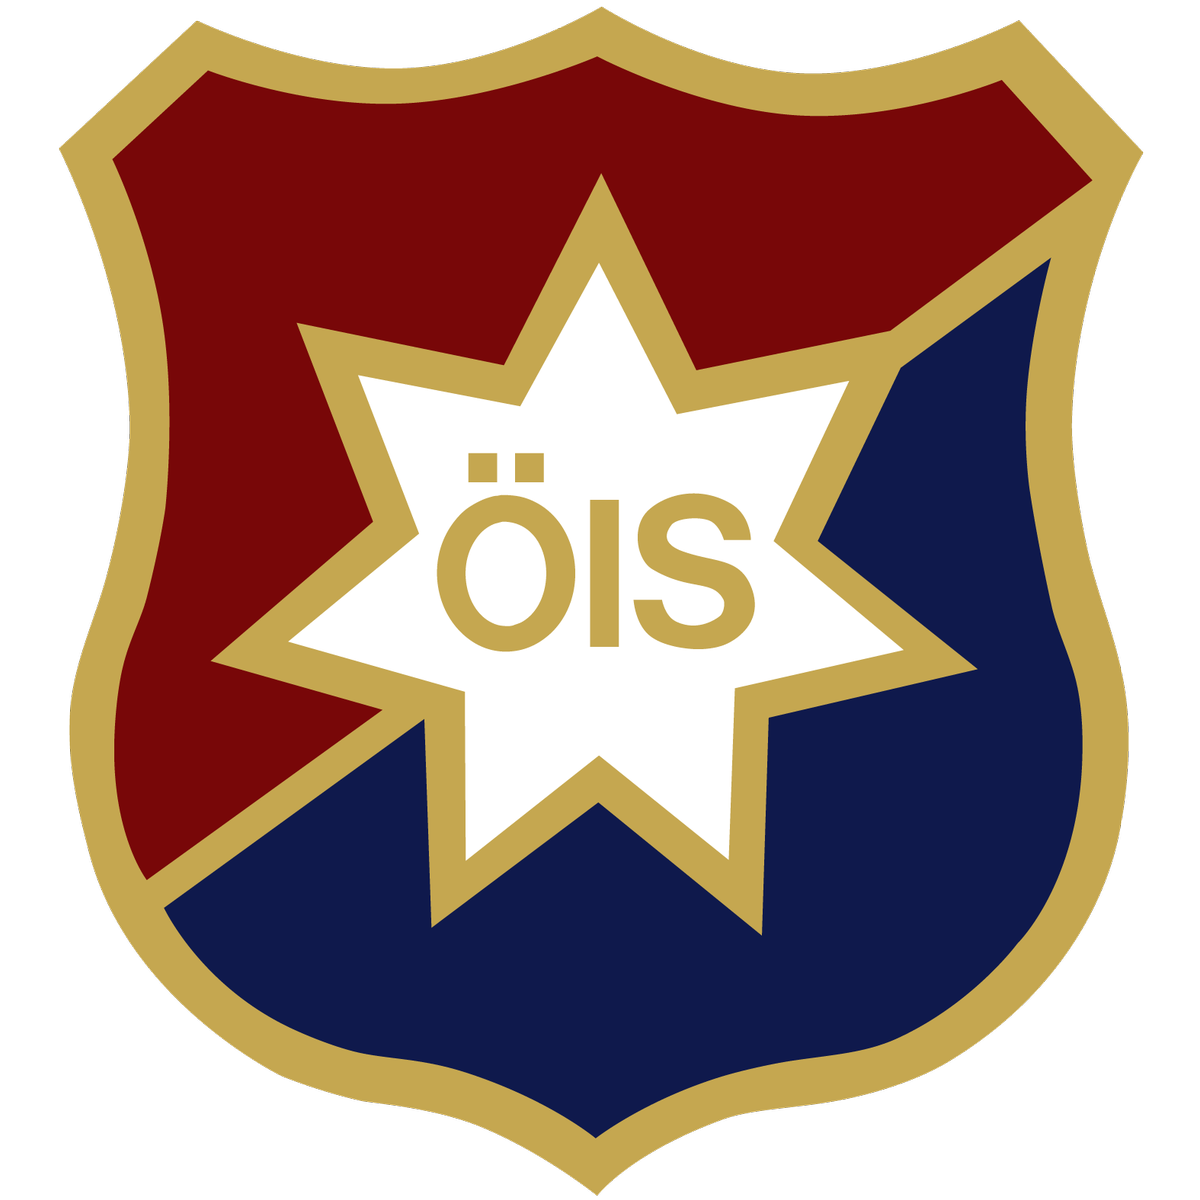 Örgryte IS emblem